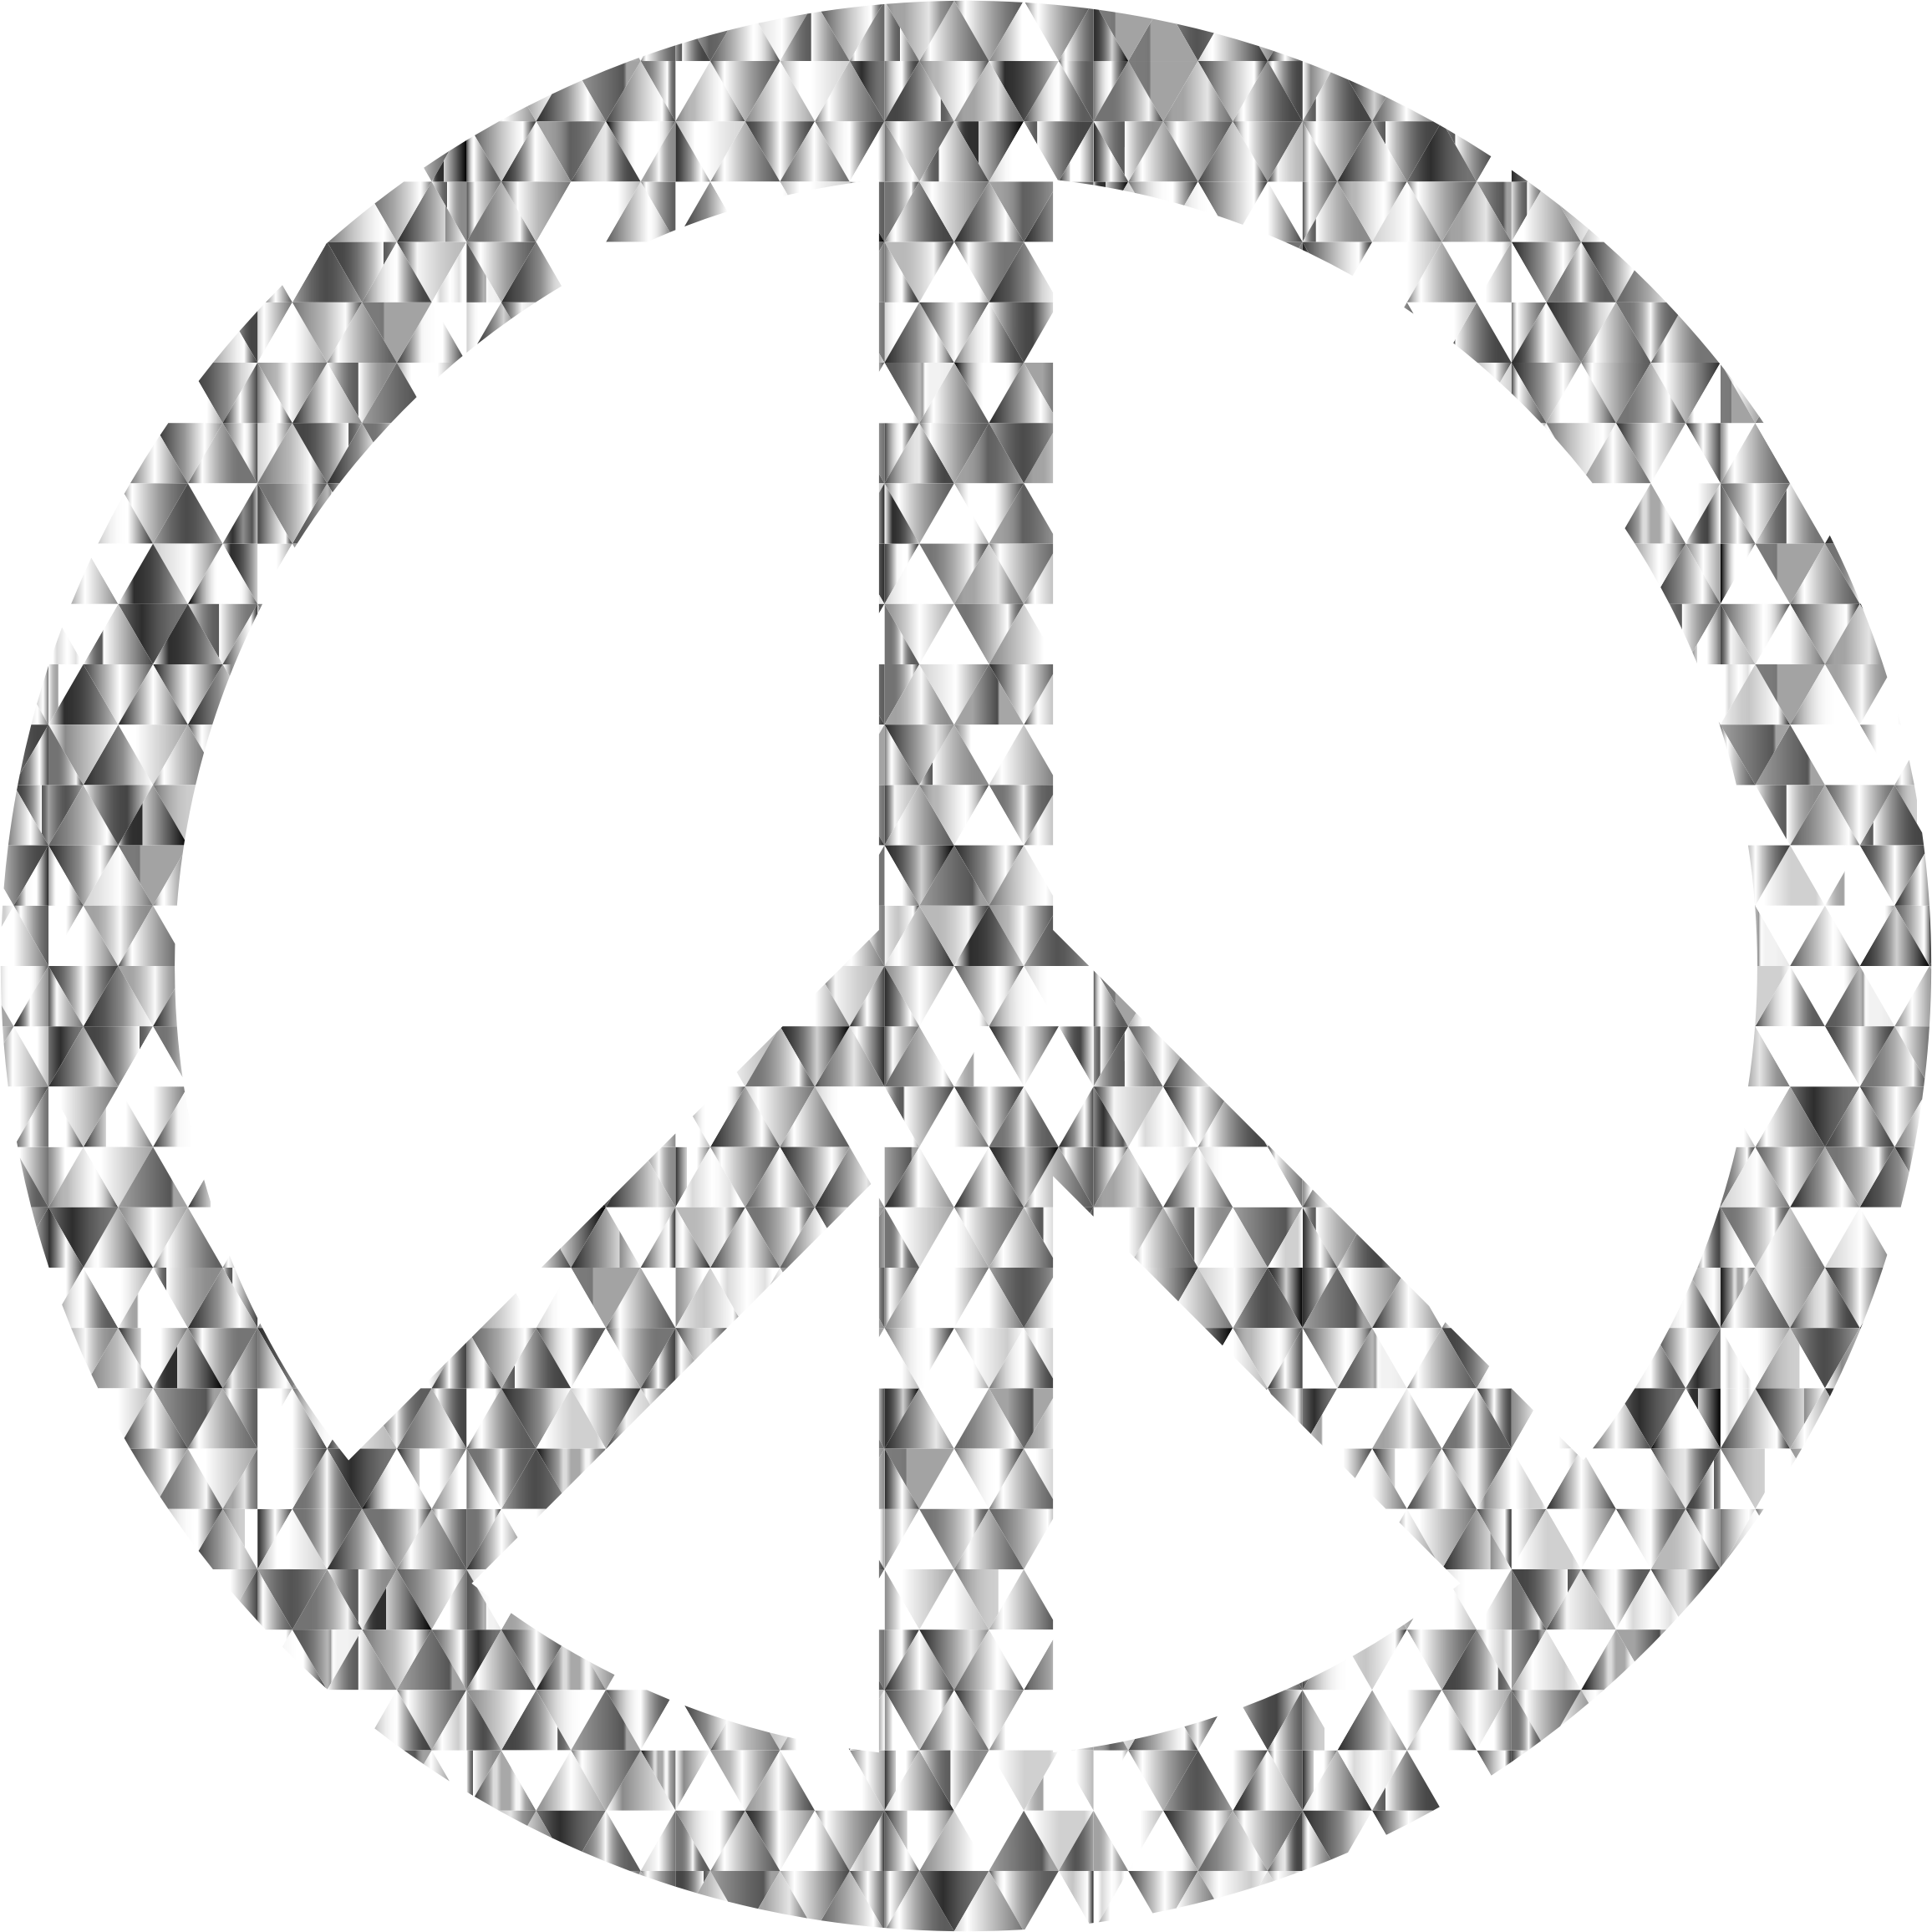 Diamond gemstone peace sign. Diamonds clipart circle